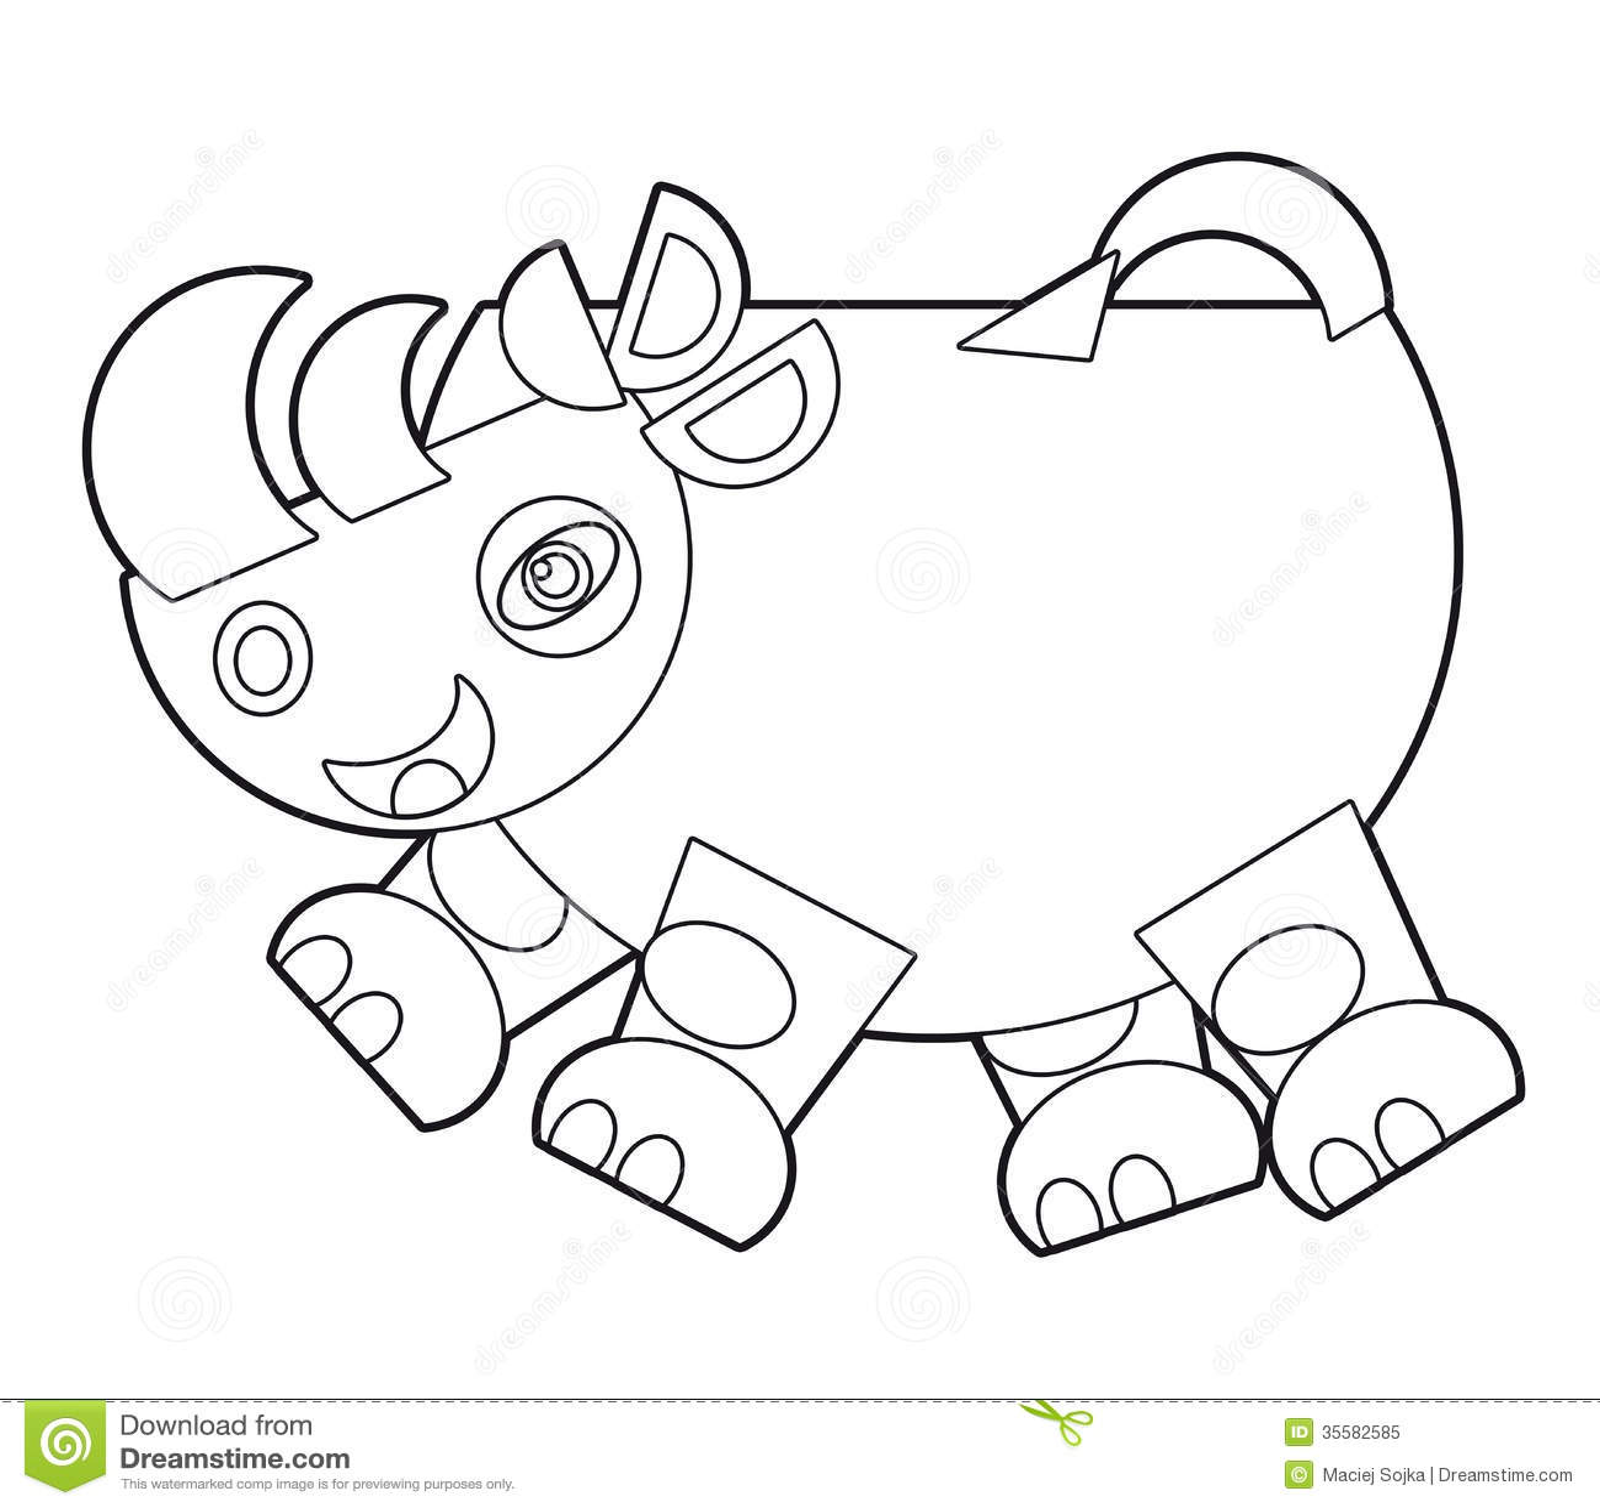 cartoon wild animal coloring page for the children stock illustration image 35582585. Black Bedroom Furniture Sets. Home Design Ideas